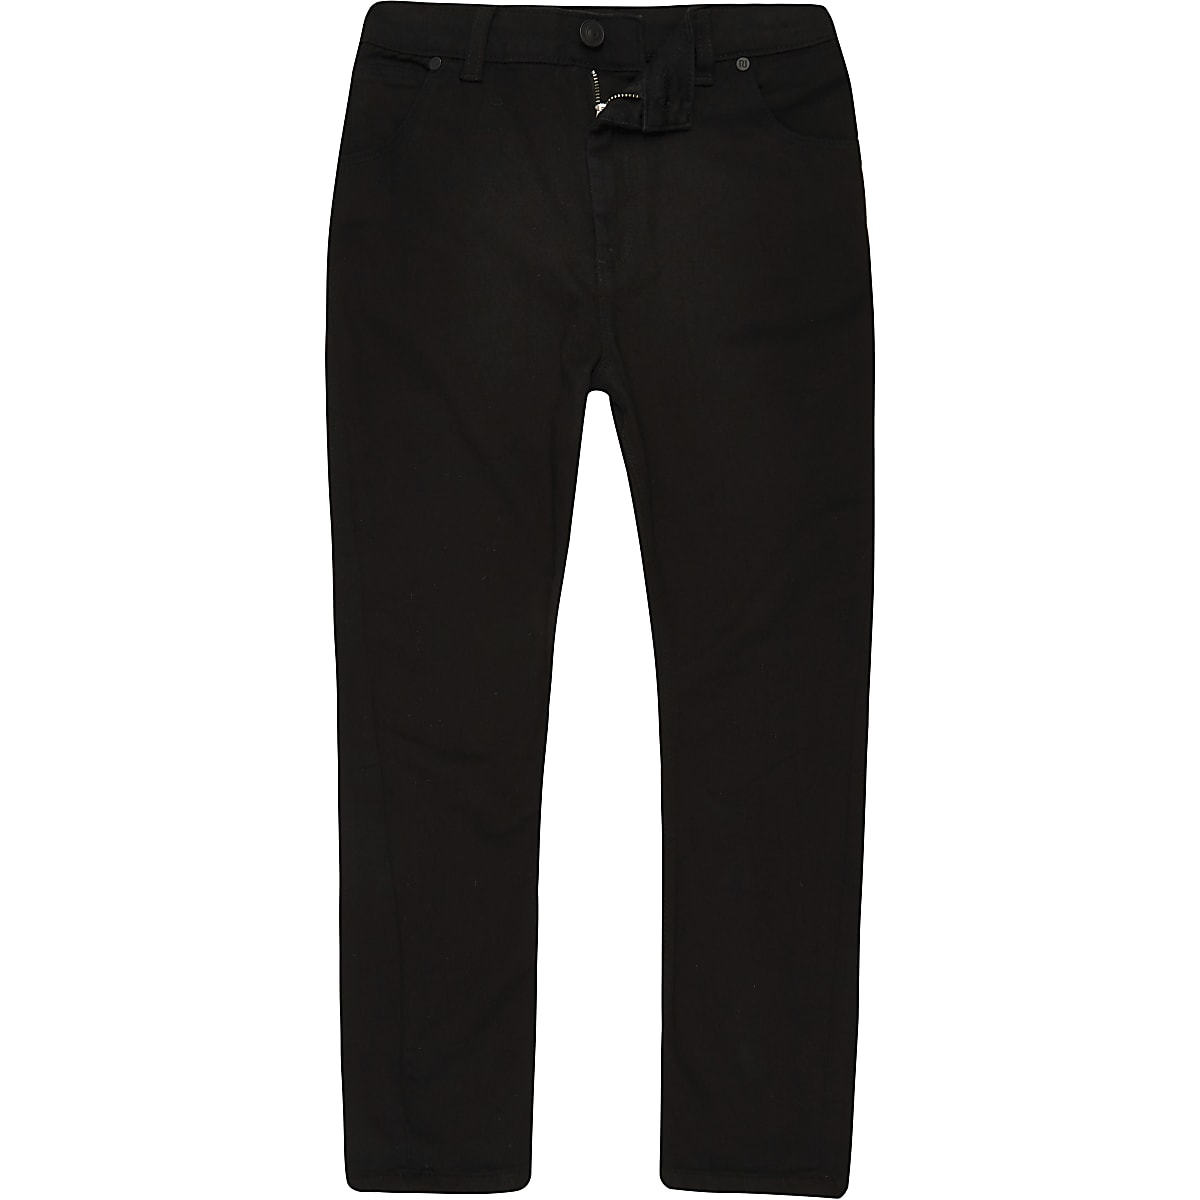 Boys black Tony tapered slouch jeans